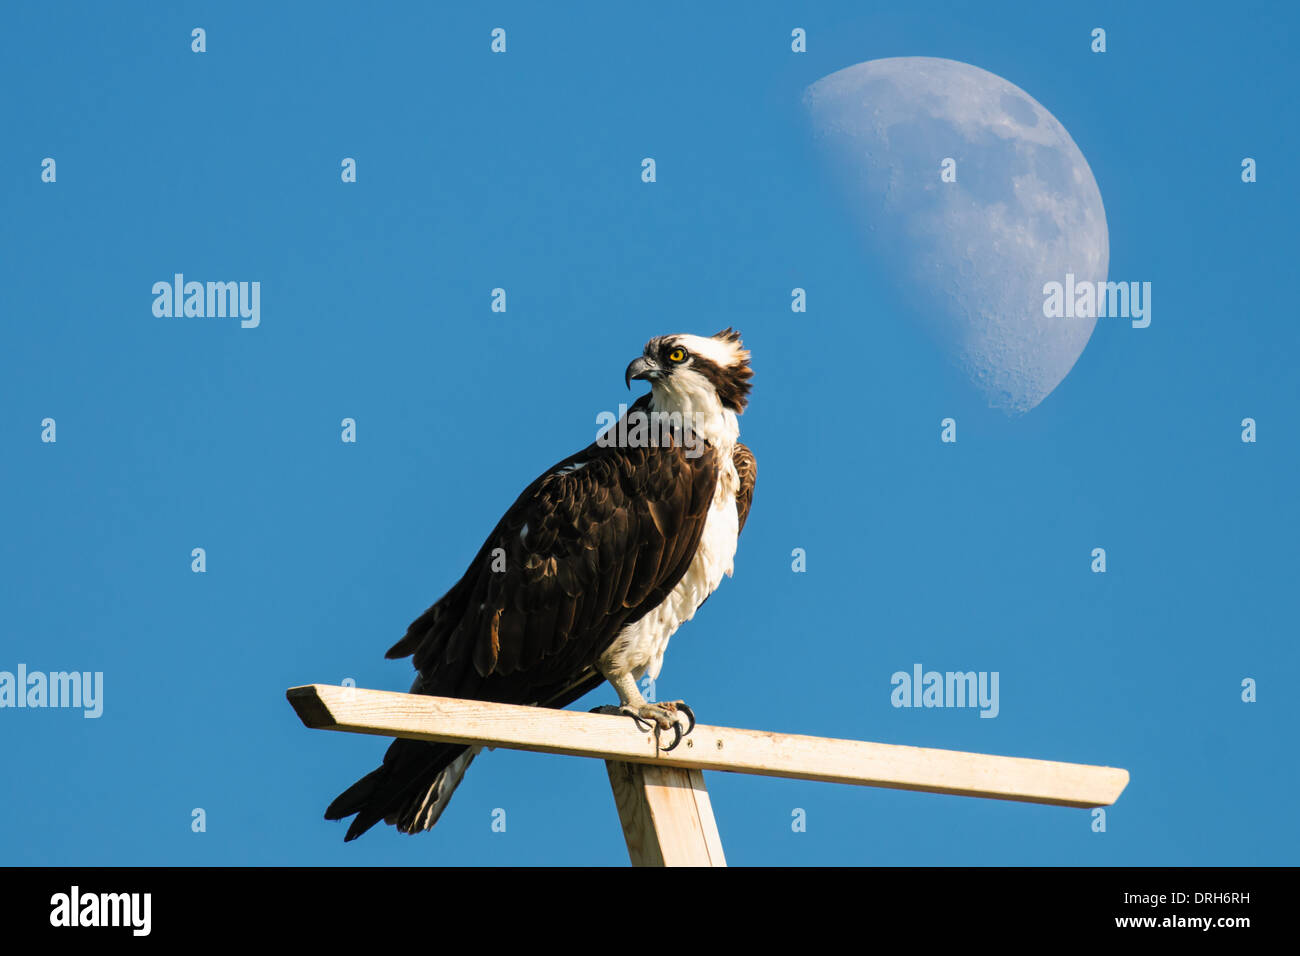 Osprey sur une perche en vertu d'un lever de lune, Alberta Canada Photo Stock